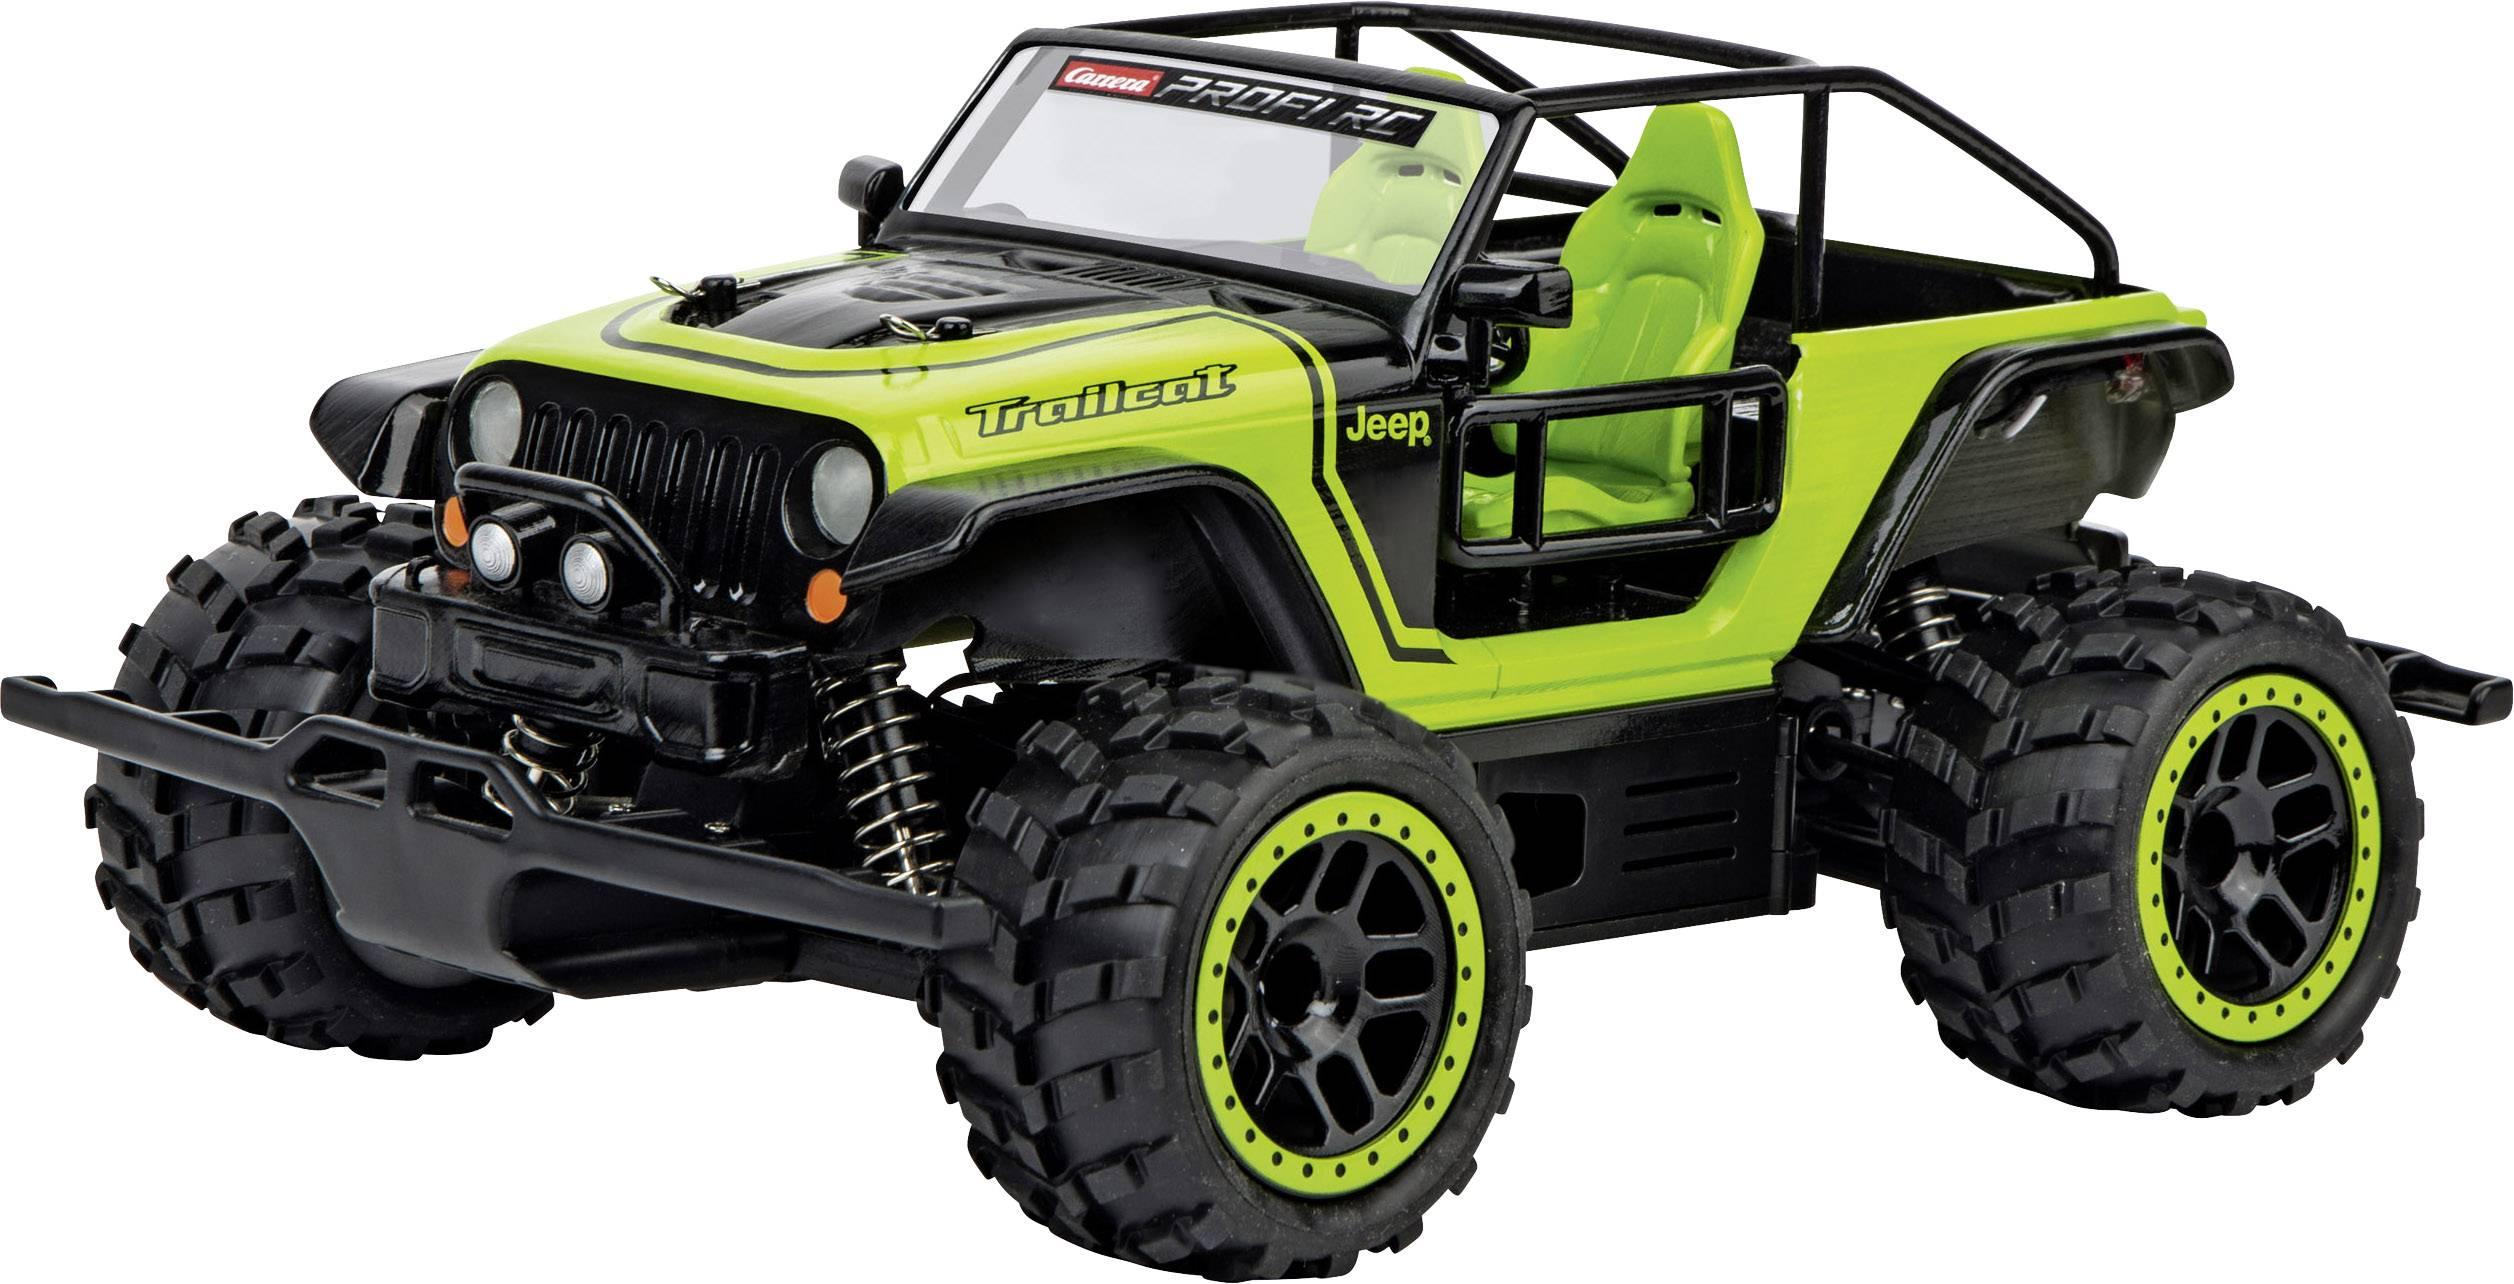 carrera rc 370183019 jeep trailcat ax 1 18 rc einsteiger modellauto elektro gel ndewagen inkl. Black Bedroom Furniture Sets. Home Design Ideas